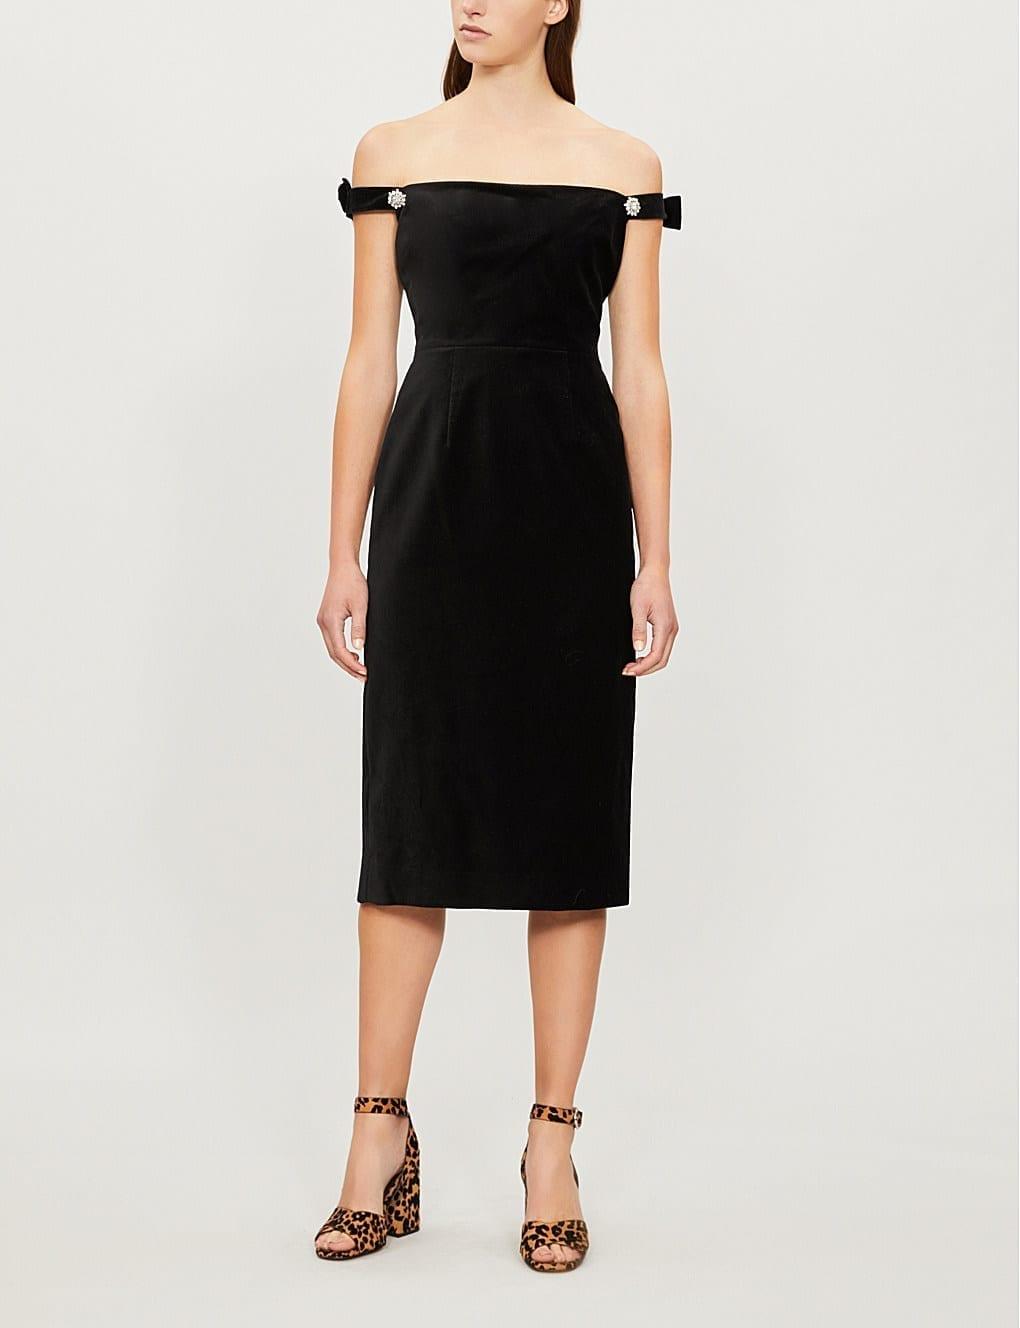 ALEXACHUNG Off The-shoulder Cotton Velvet Black Dress